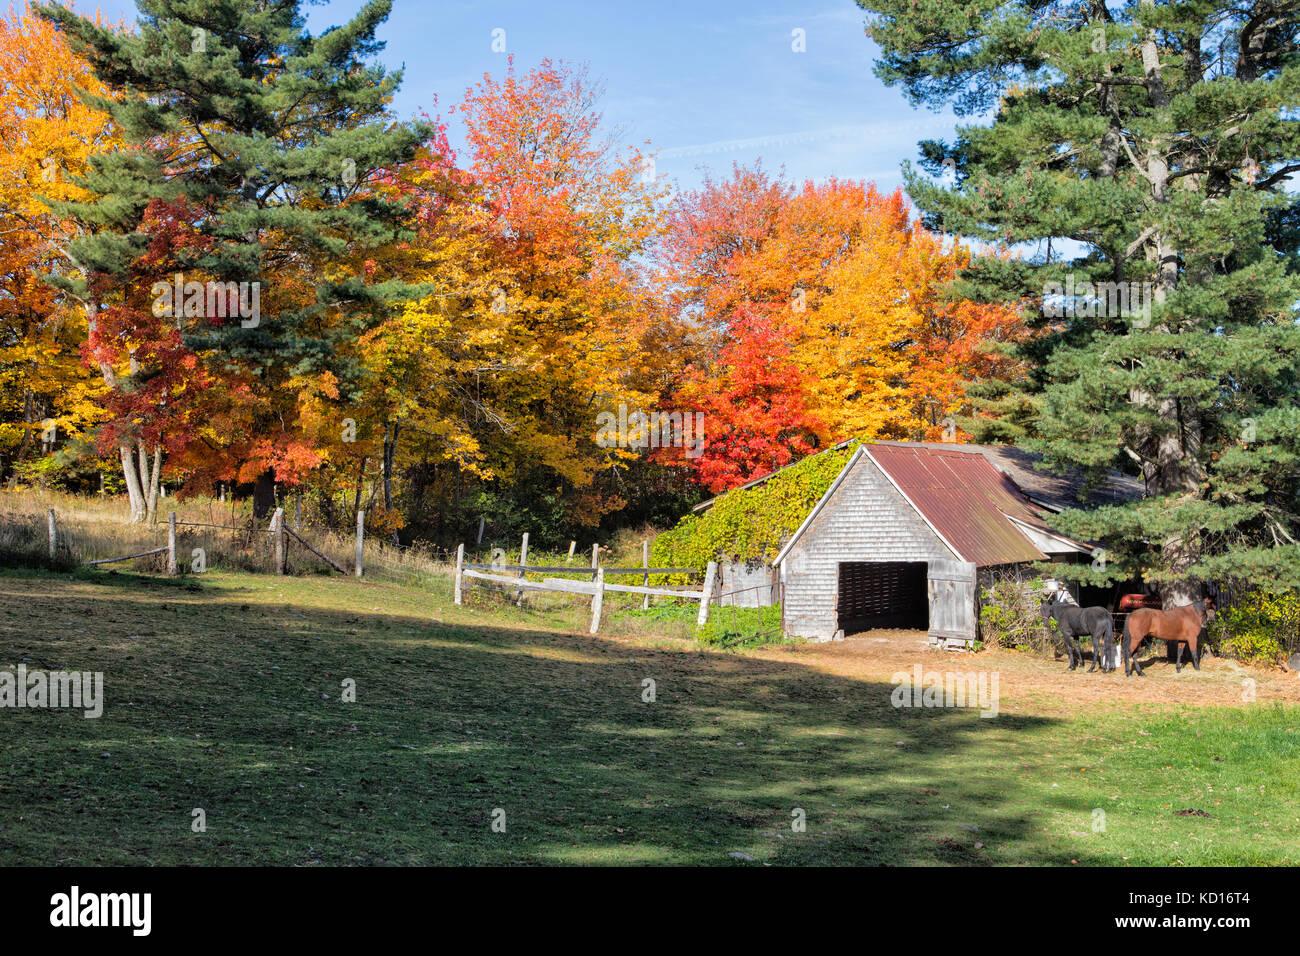 Bar and horses, Upper Hampstead, New Brunswick, Canada - Stock Image